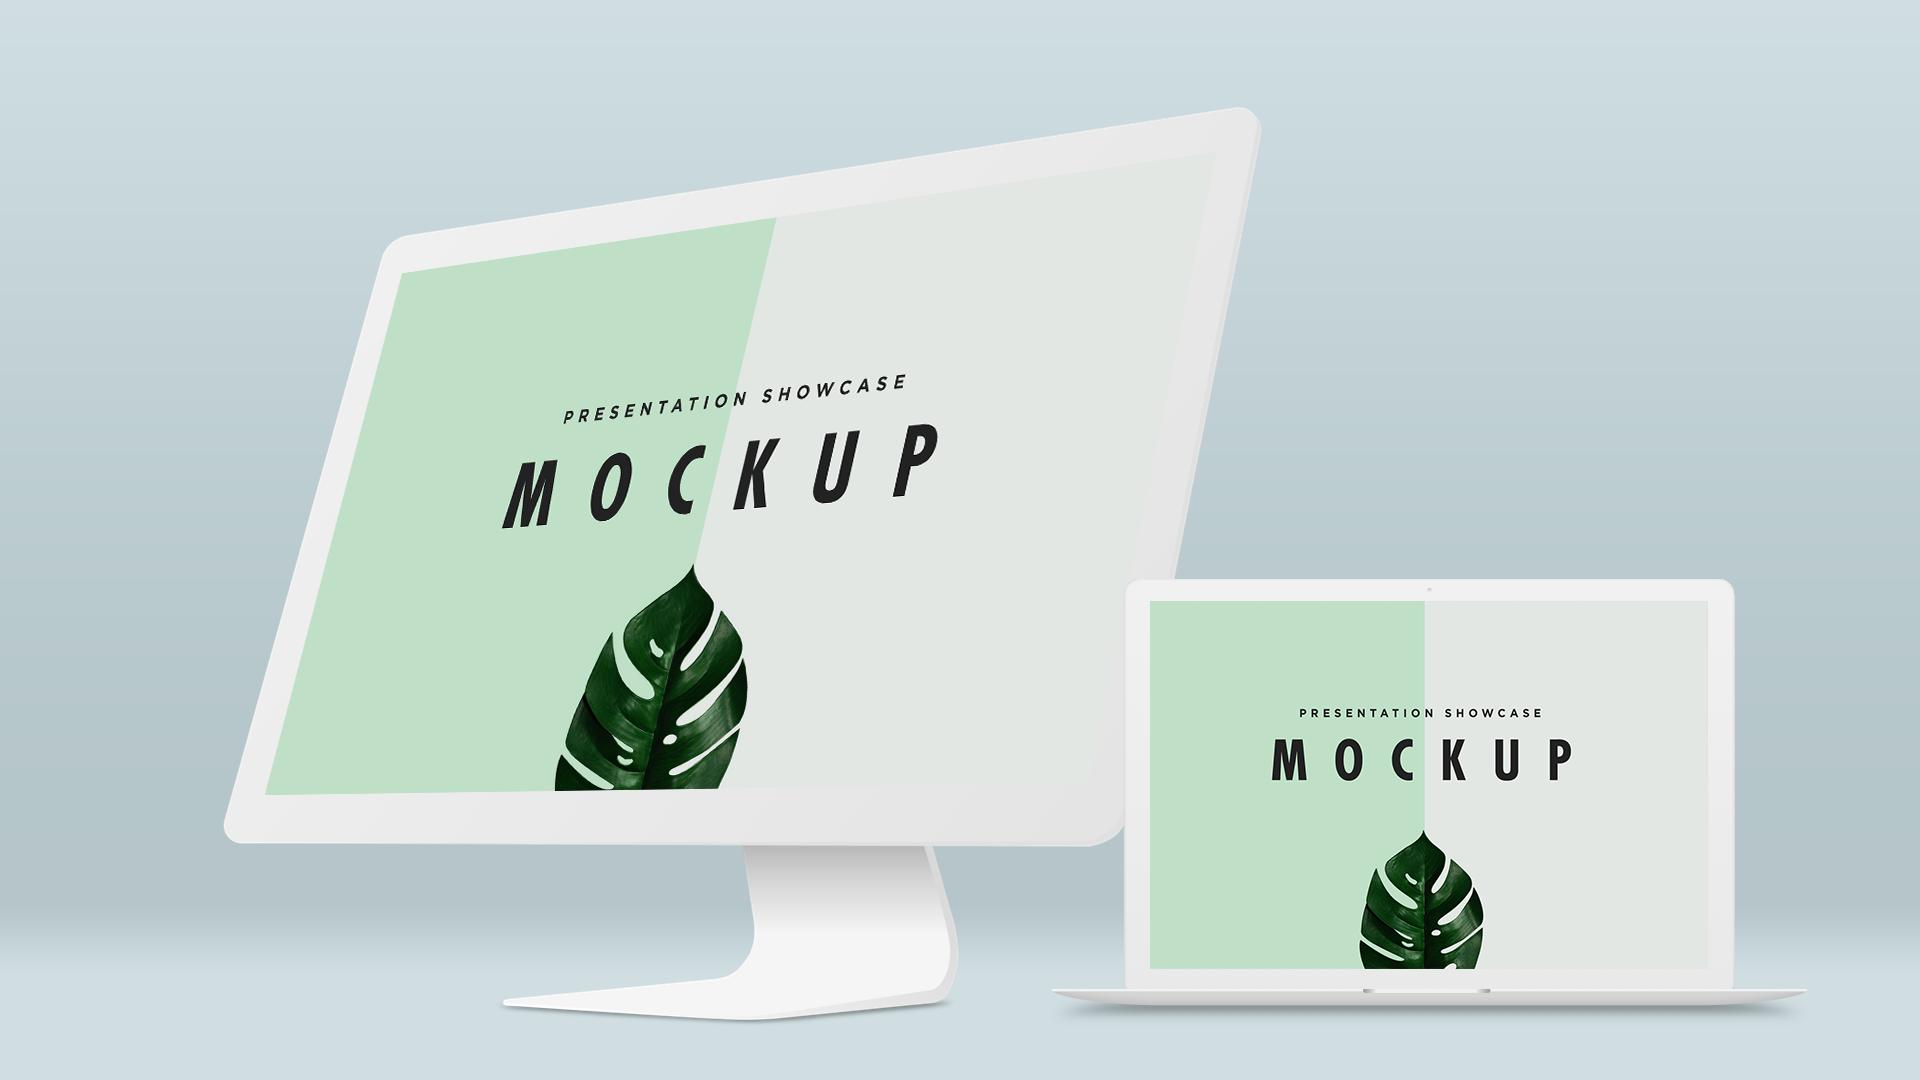 Macbook pro imac mockup template | Mockup | Pinterest